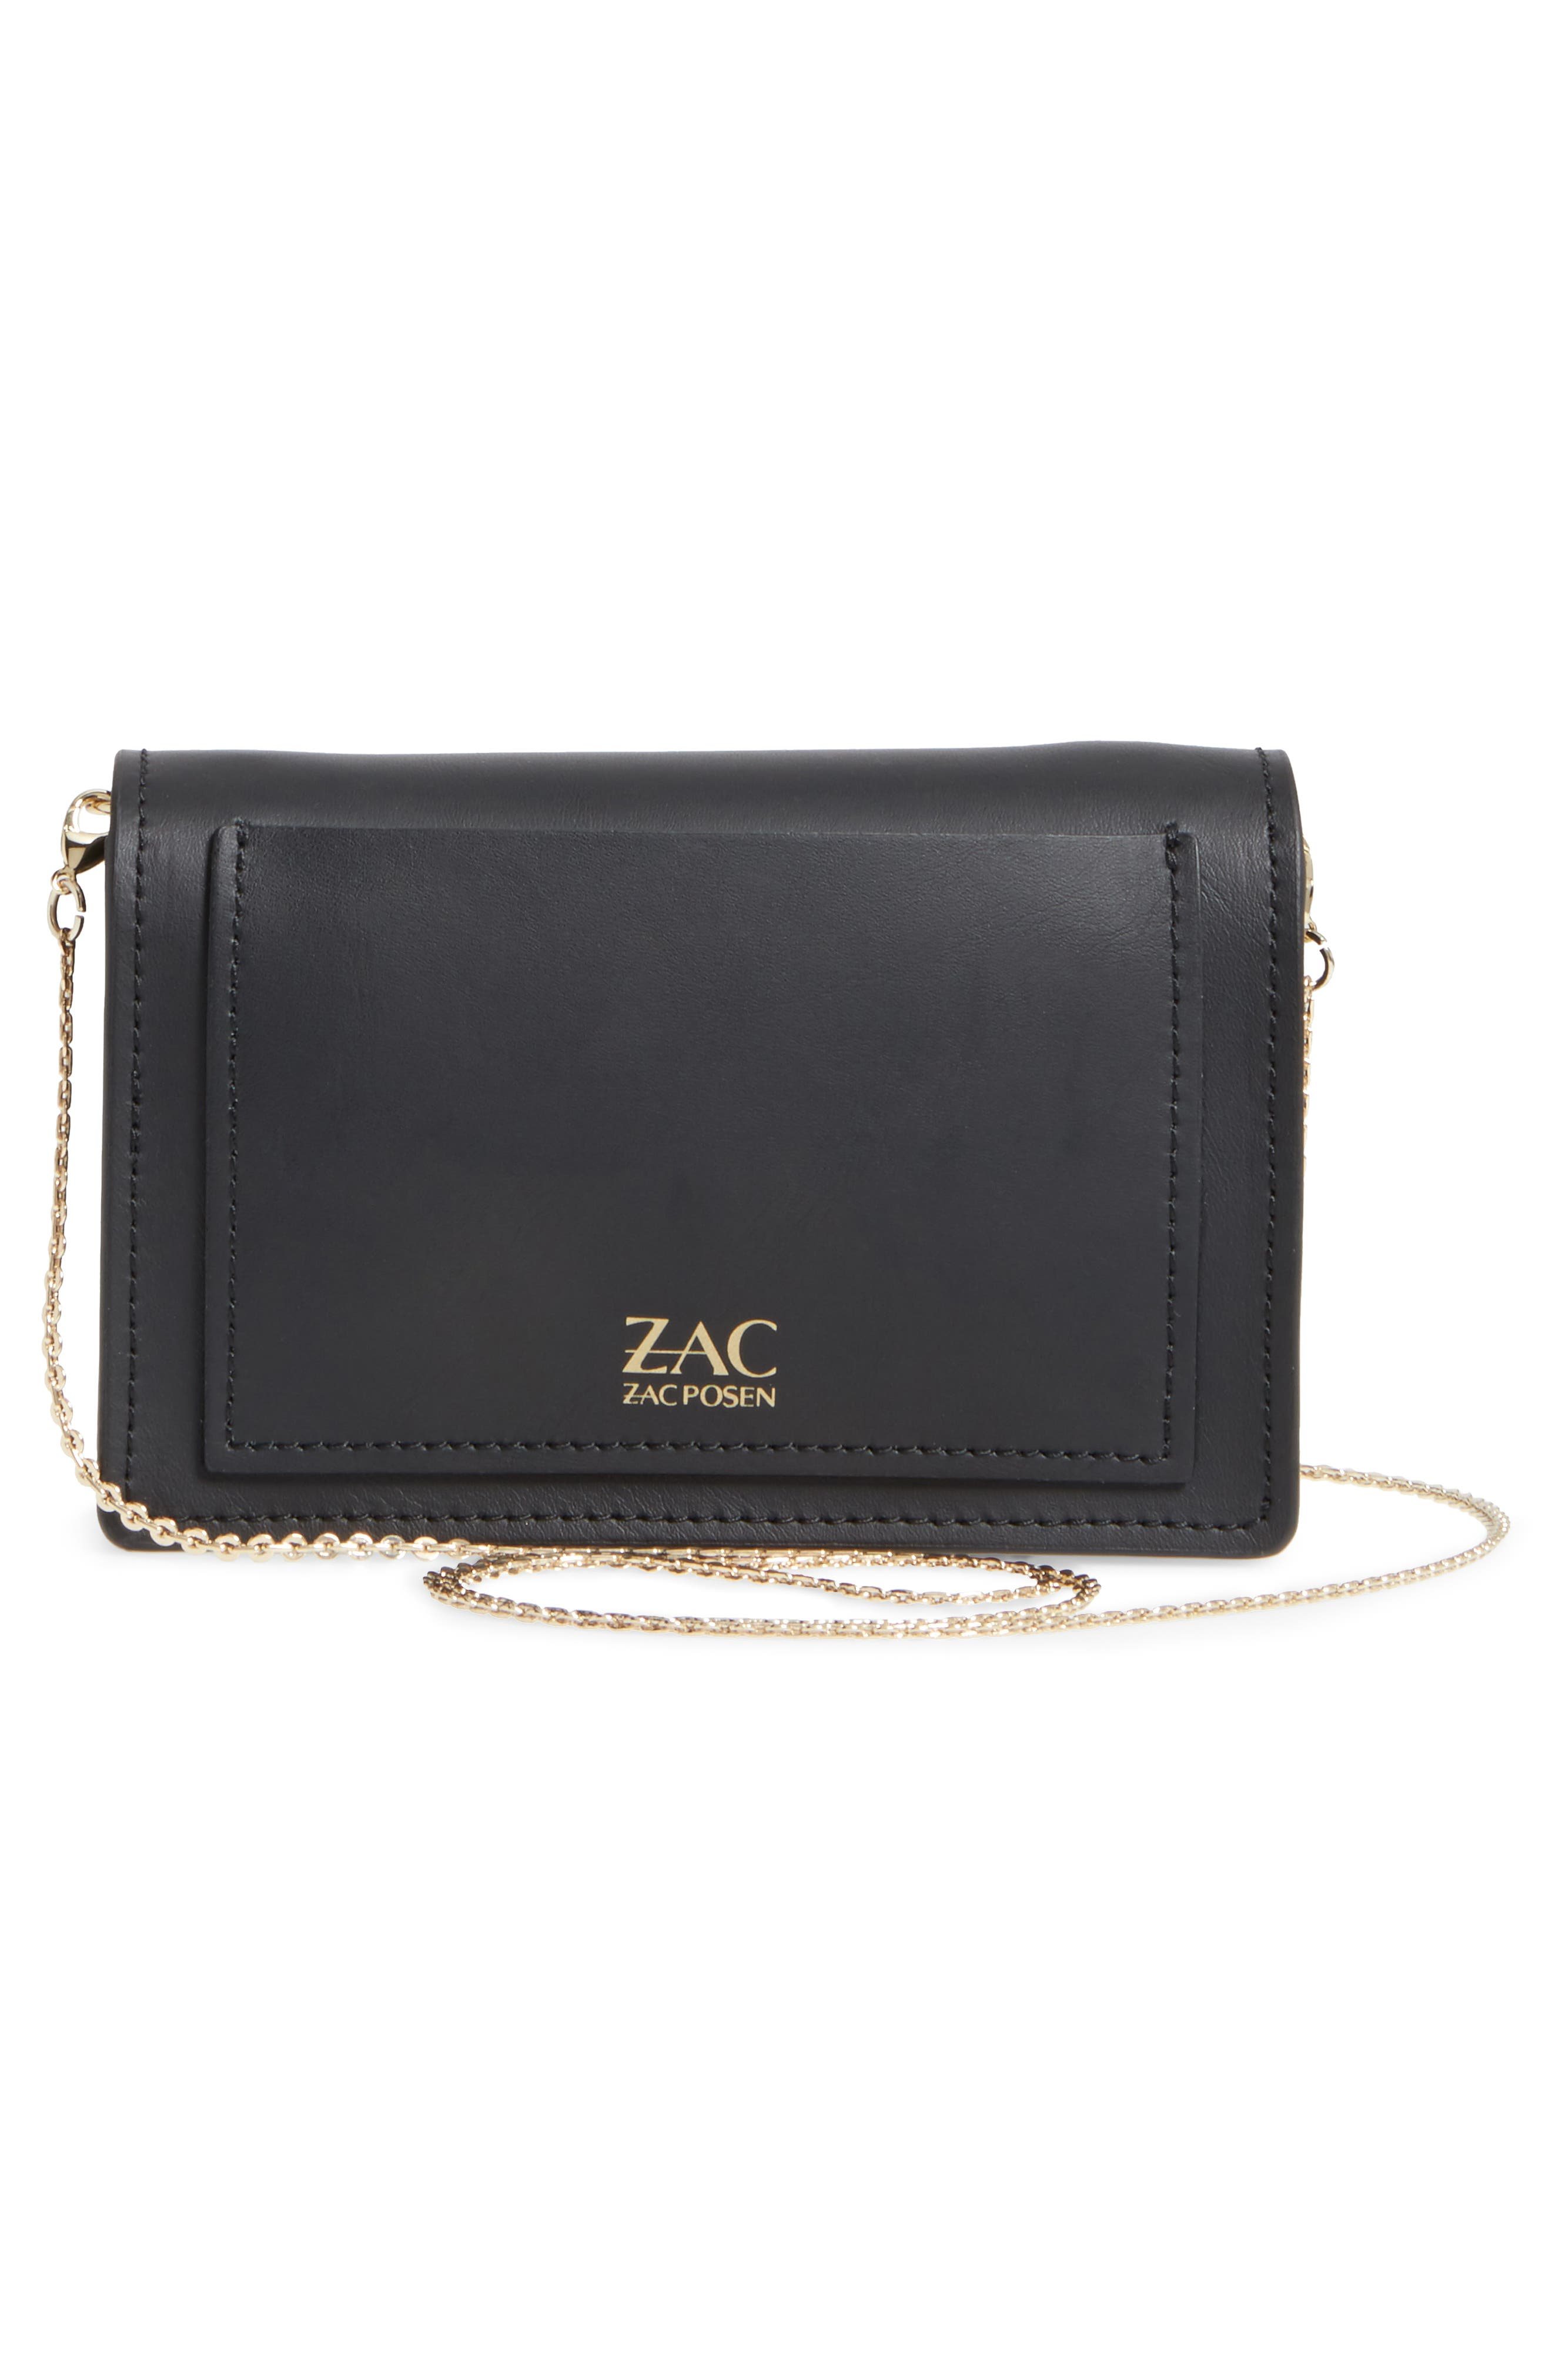 ZAC Zac Posen Earthette Leather Accordion Bag,                             Alternate thumbnail 3, color,                             Black